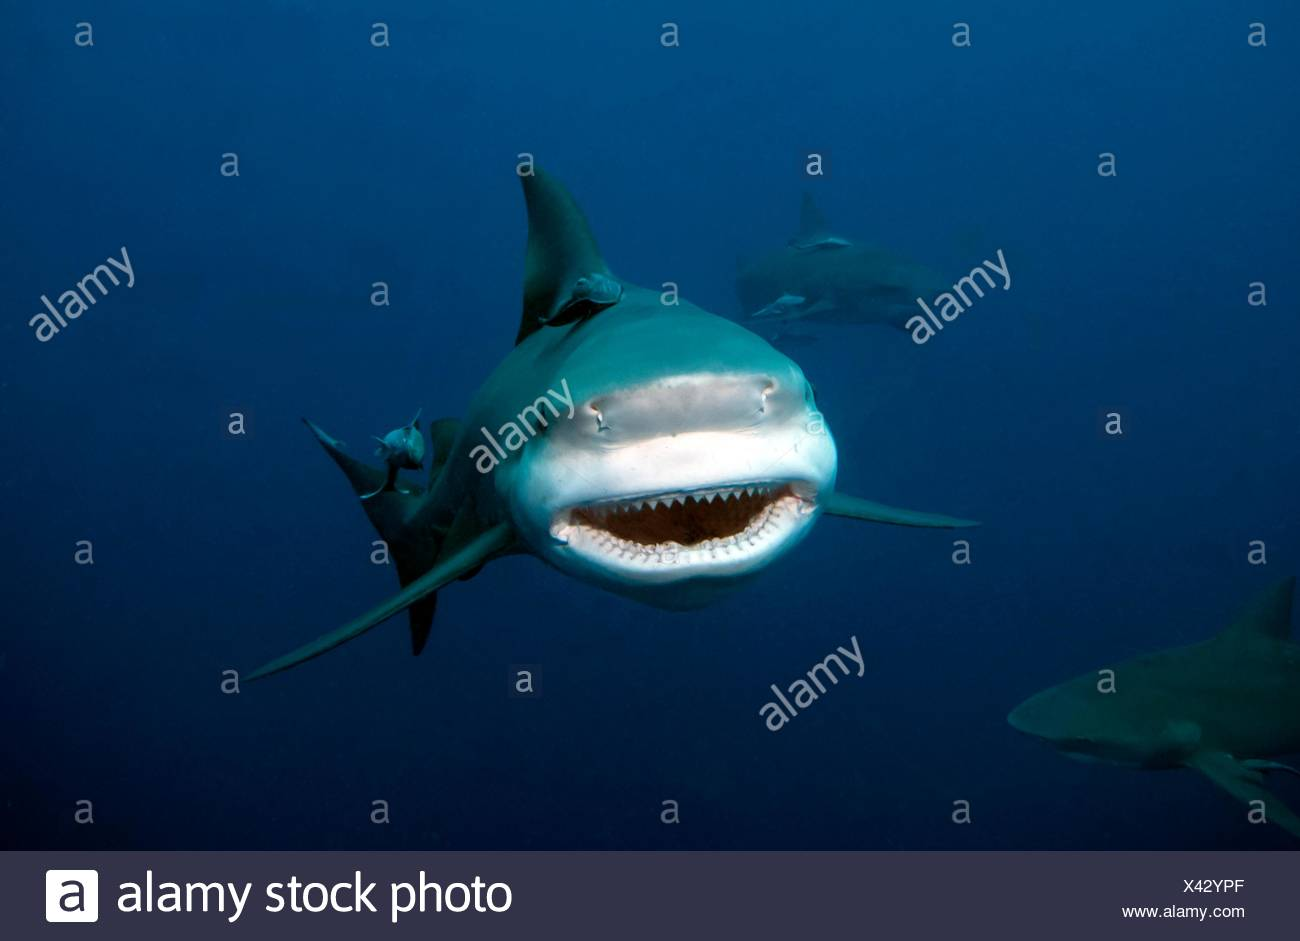 Bull shark, Carcharhinus leucas, Carcharhinidae, Mozambique, Indian Ocean Stock Photo